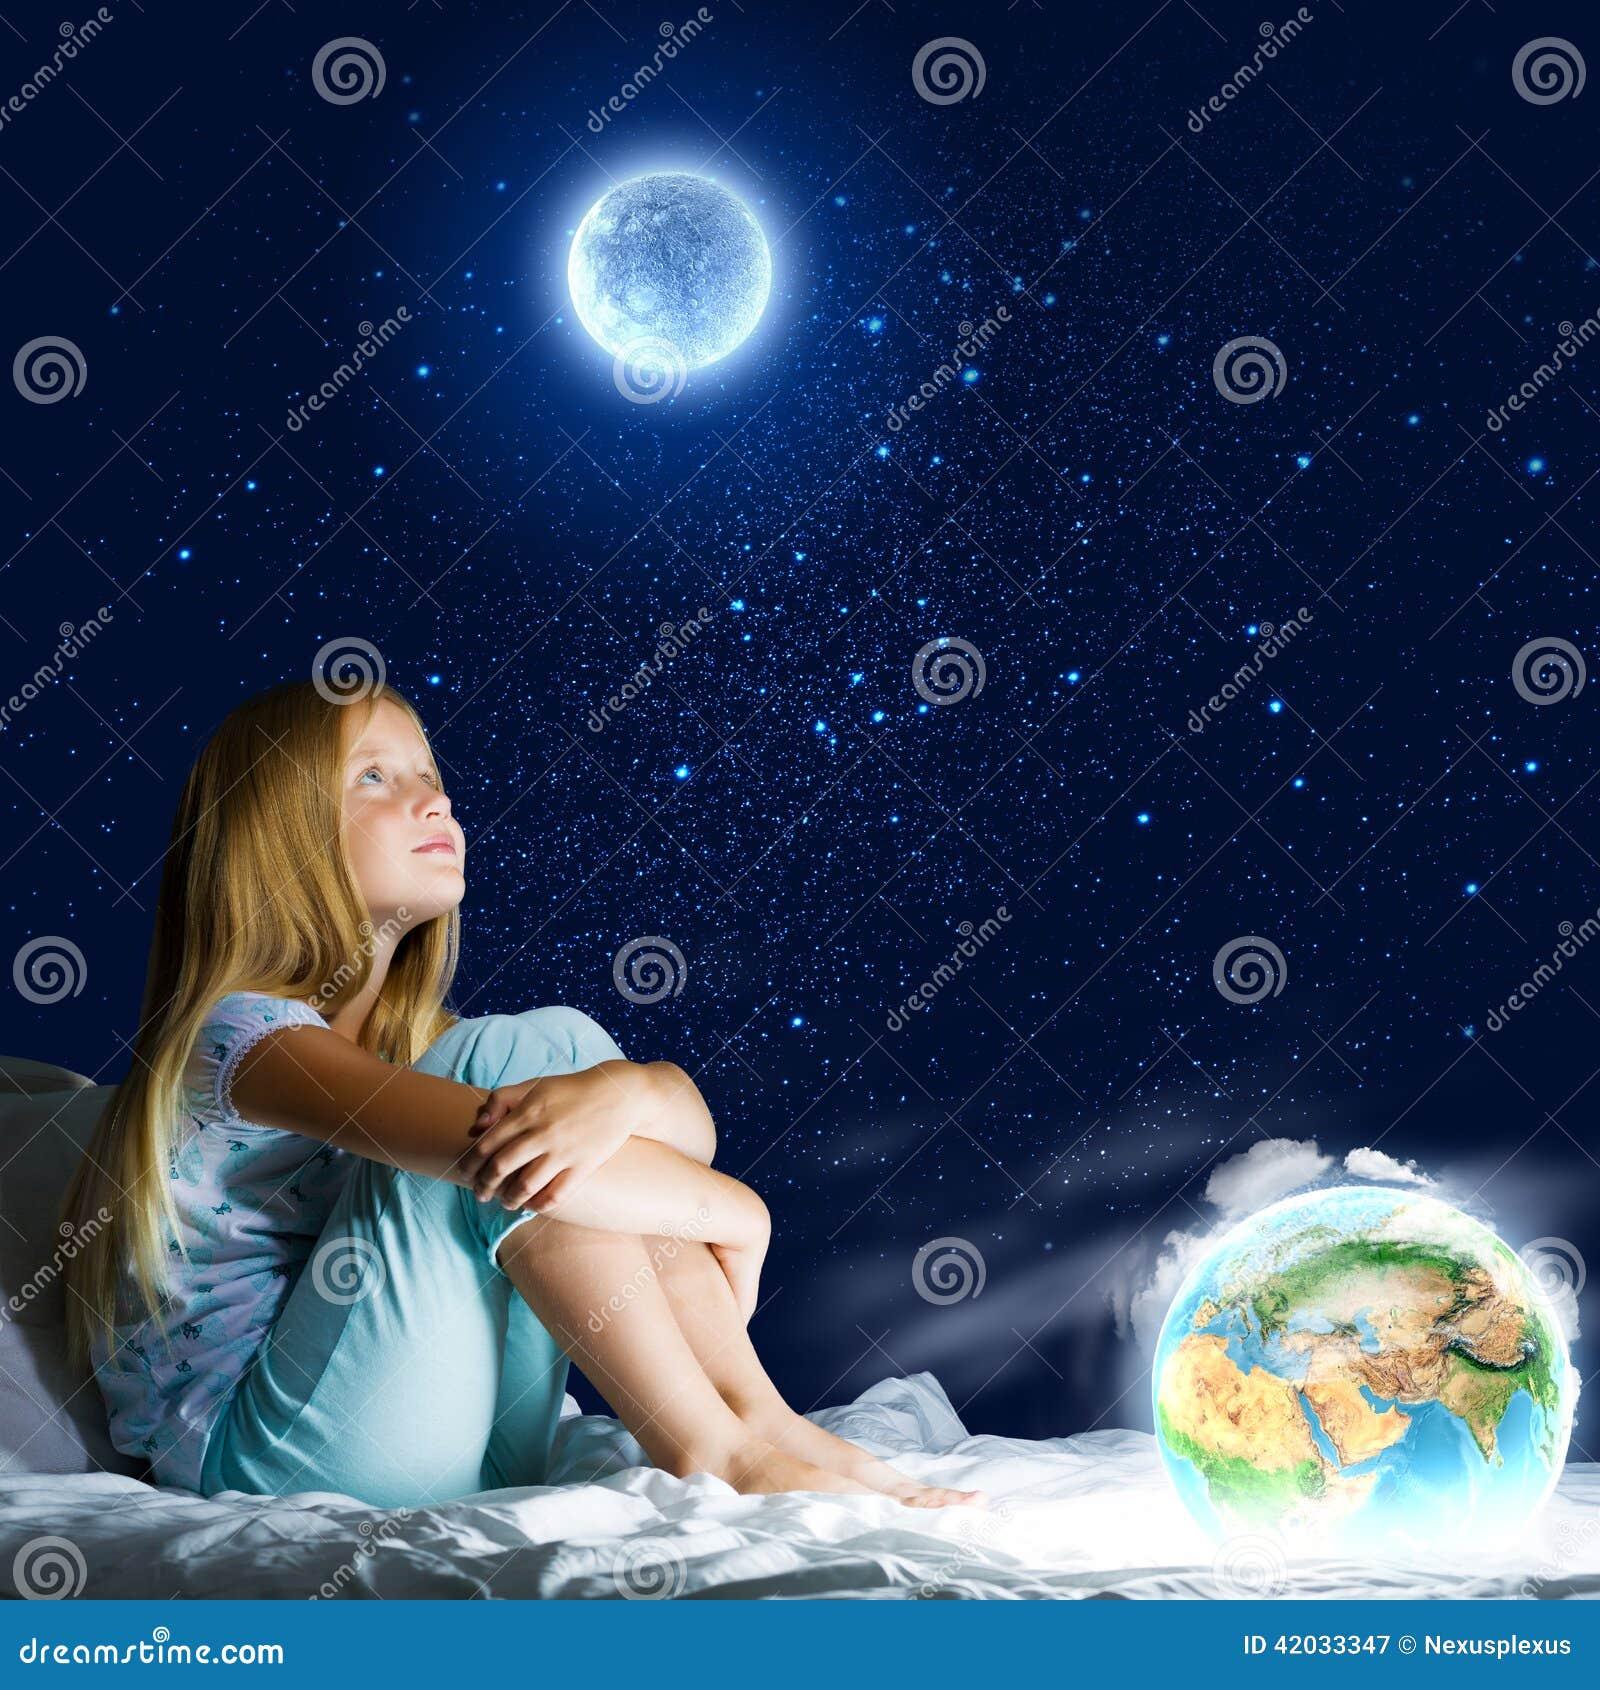 Good Night Stock Photo Image 42033347